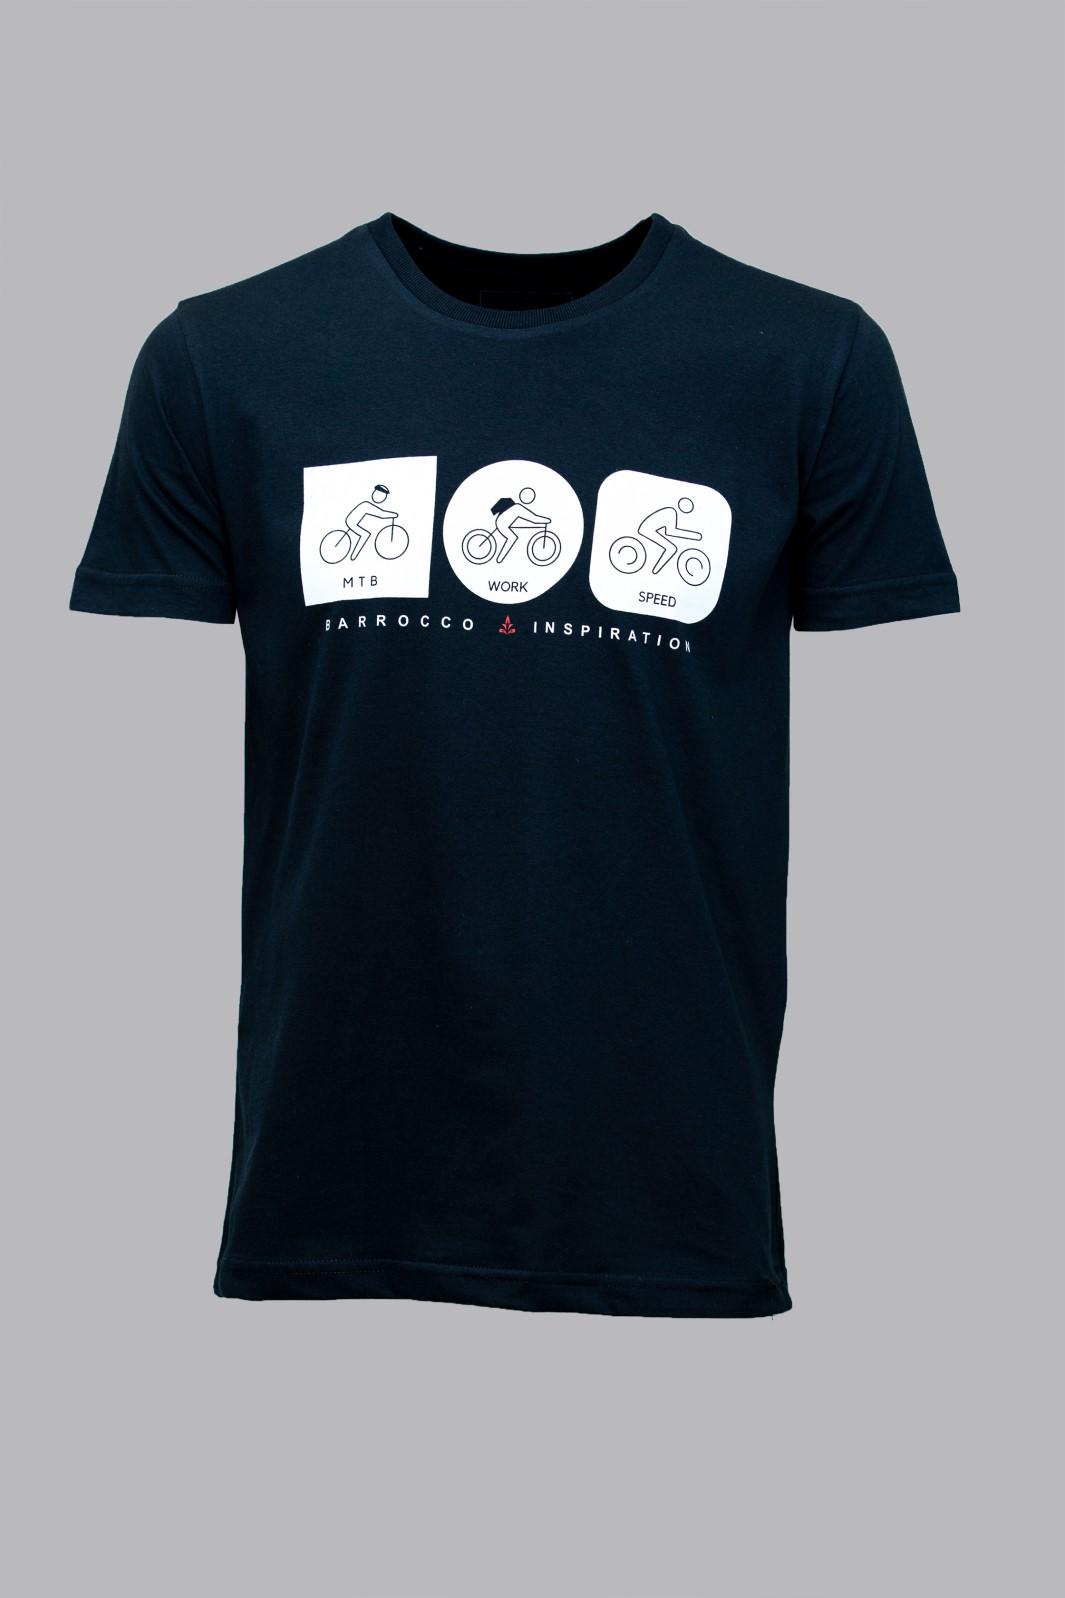 Camiseta Barrocco MTB, Work and Speed